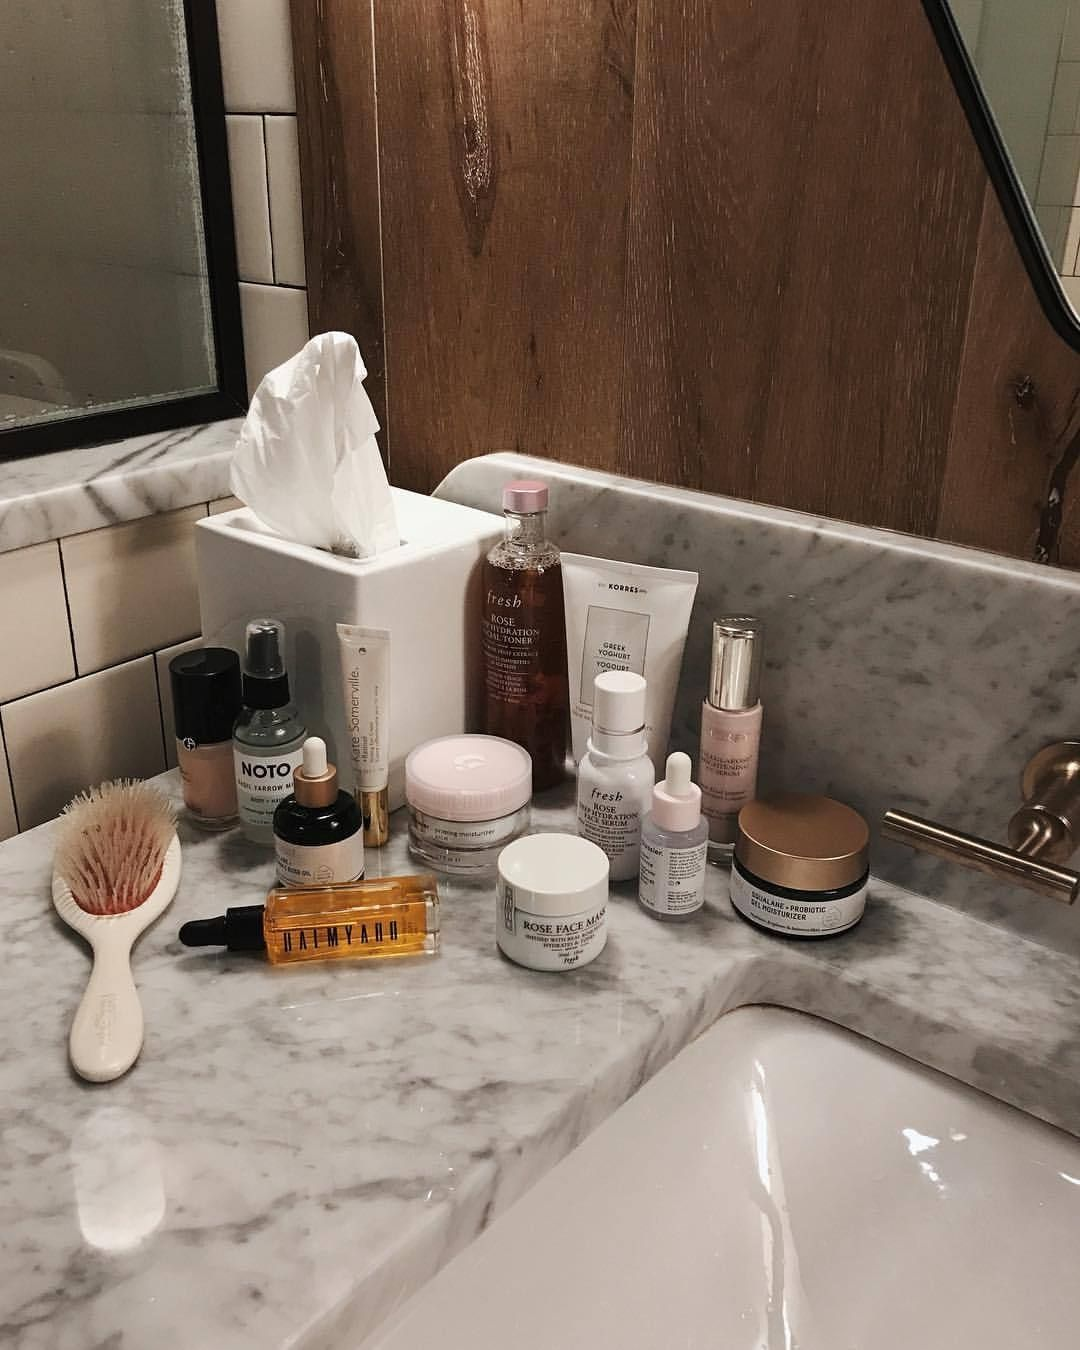 Pin by 🍒 on SELF CARE in 2020 Beauty vanity, Beauty skin